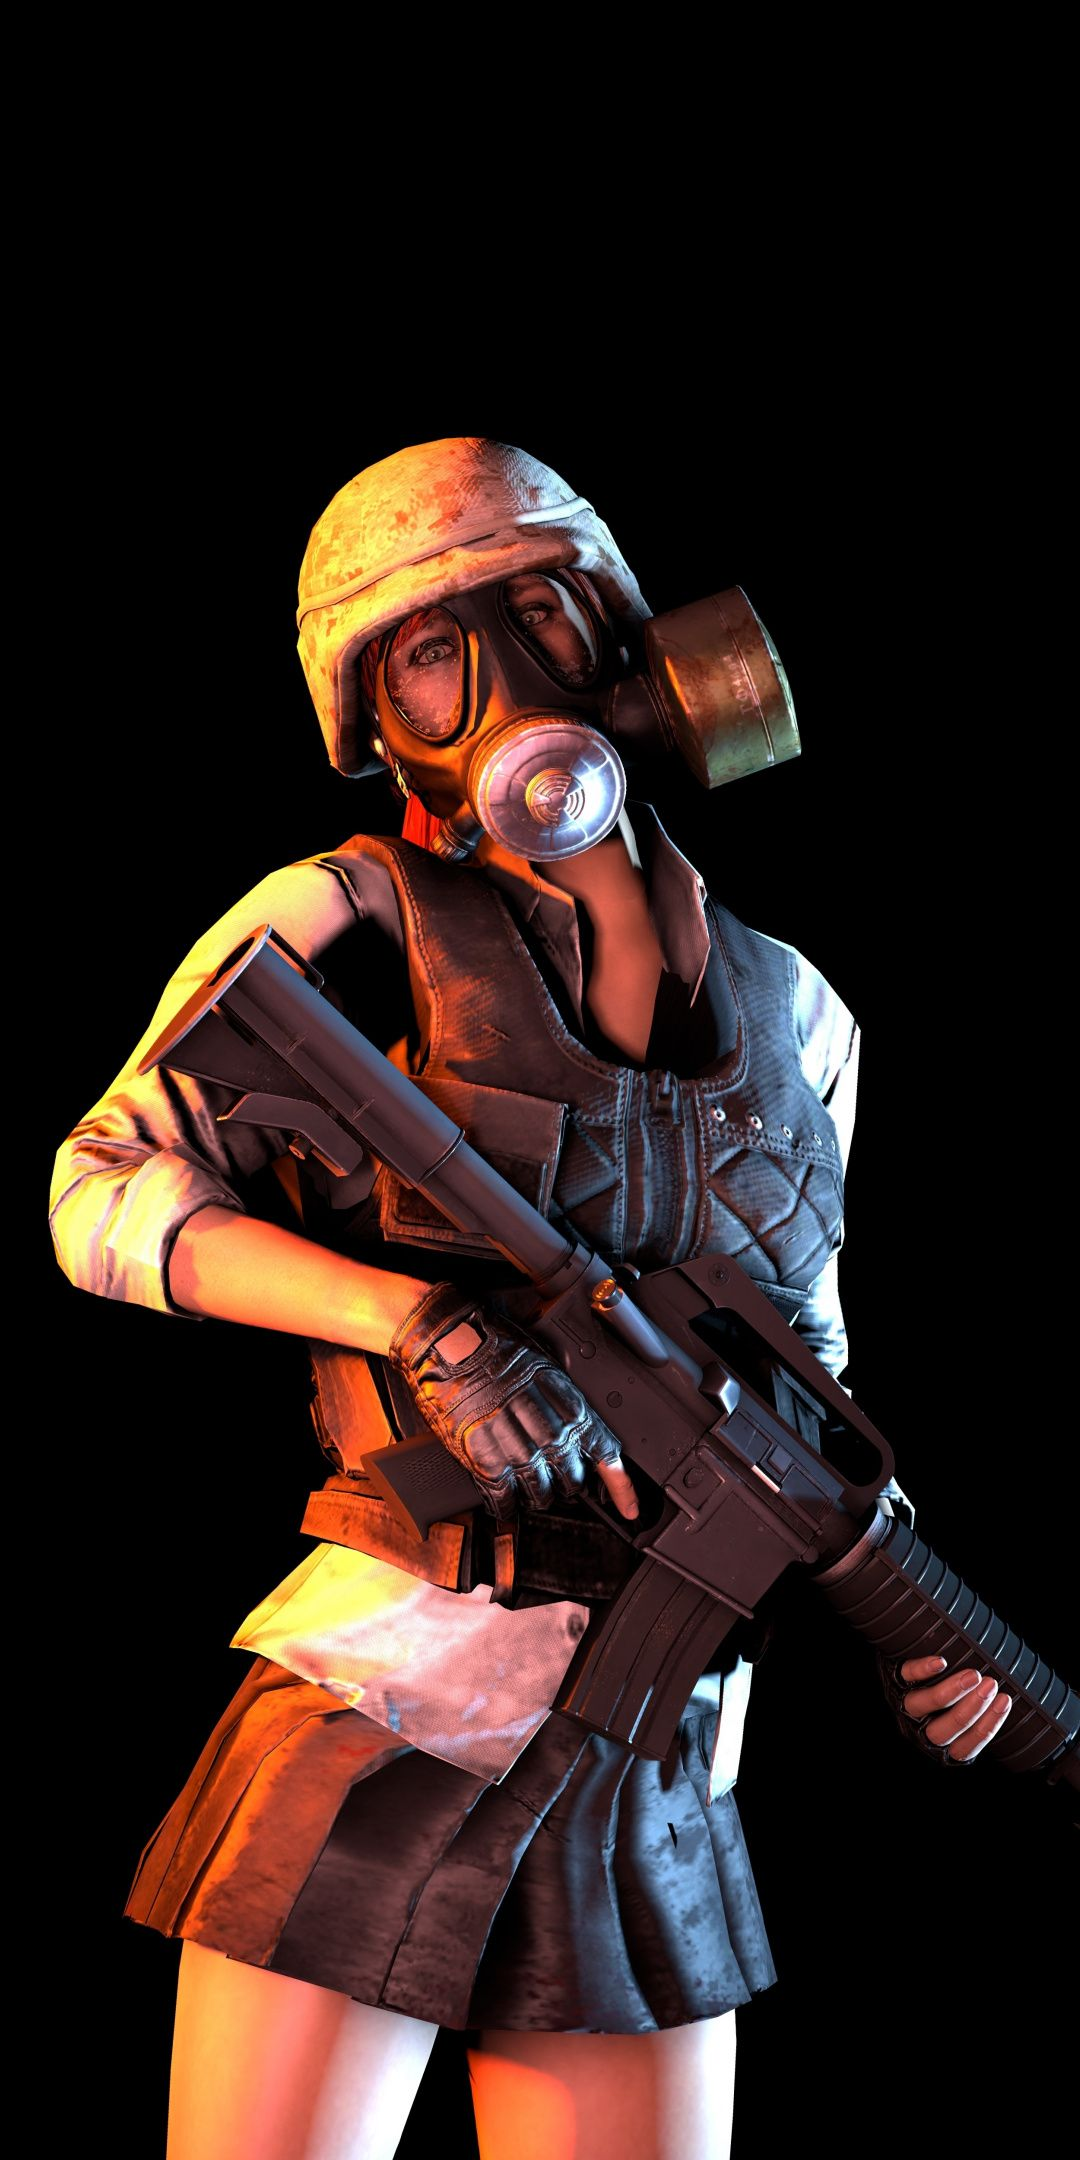 PUBG, mask girl with gun, video game, 1080x2160 wallpaper